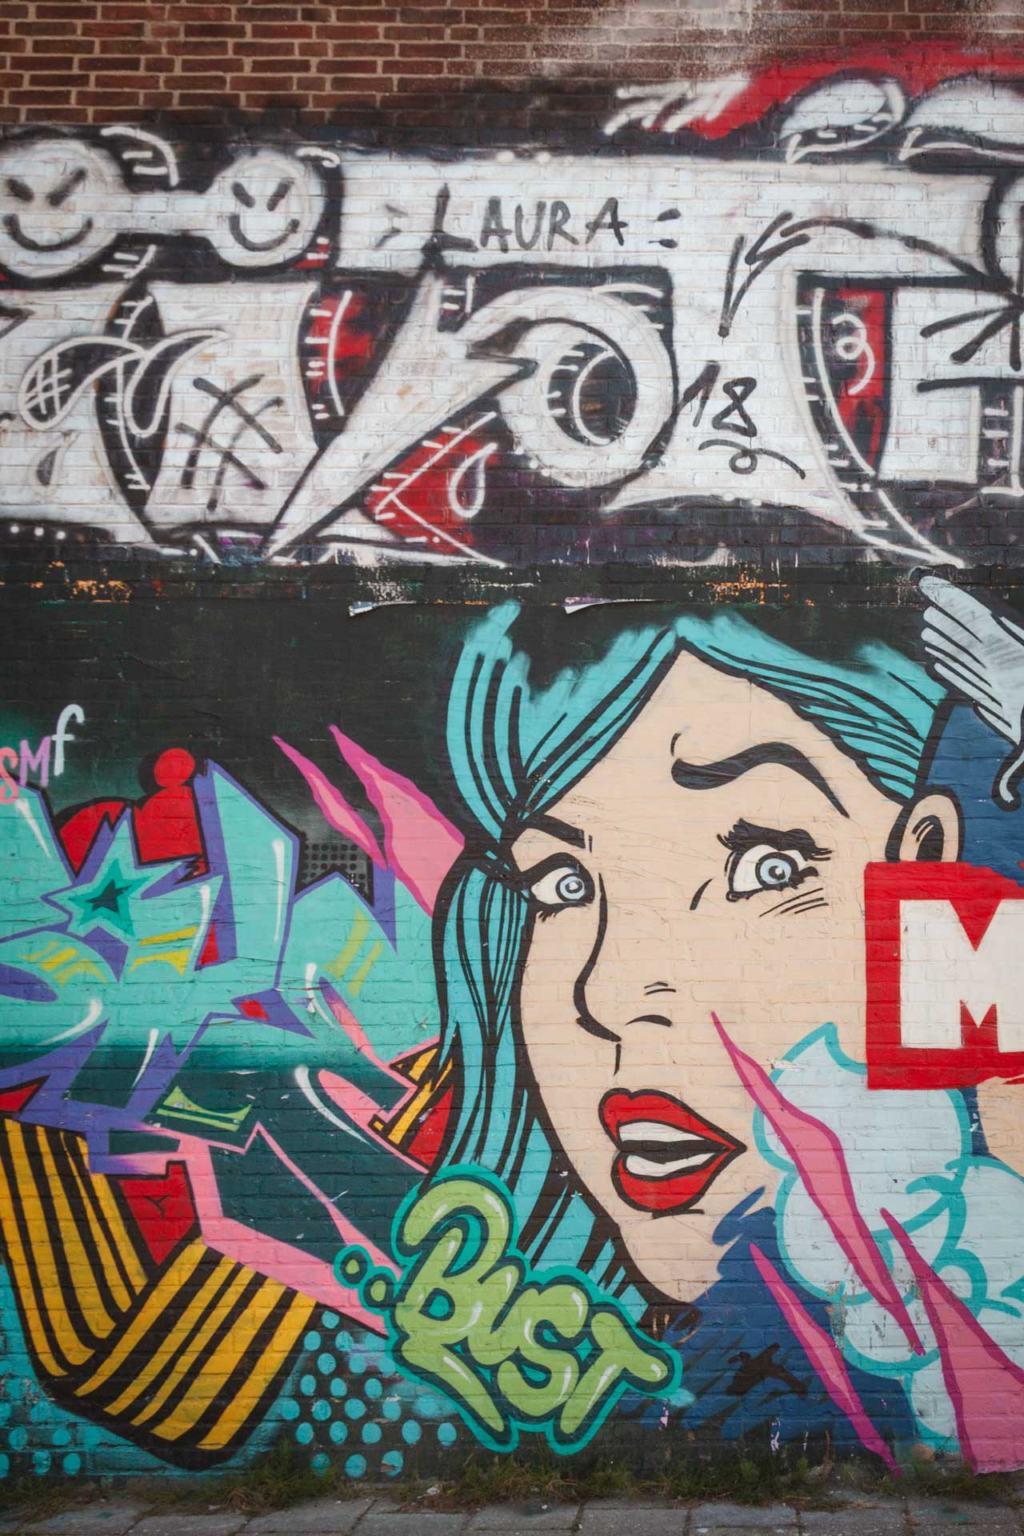 Street art at NDSM Werf, Amsterdam Noord